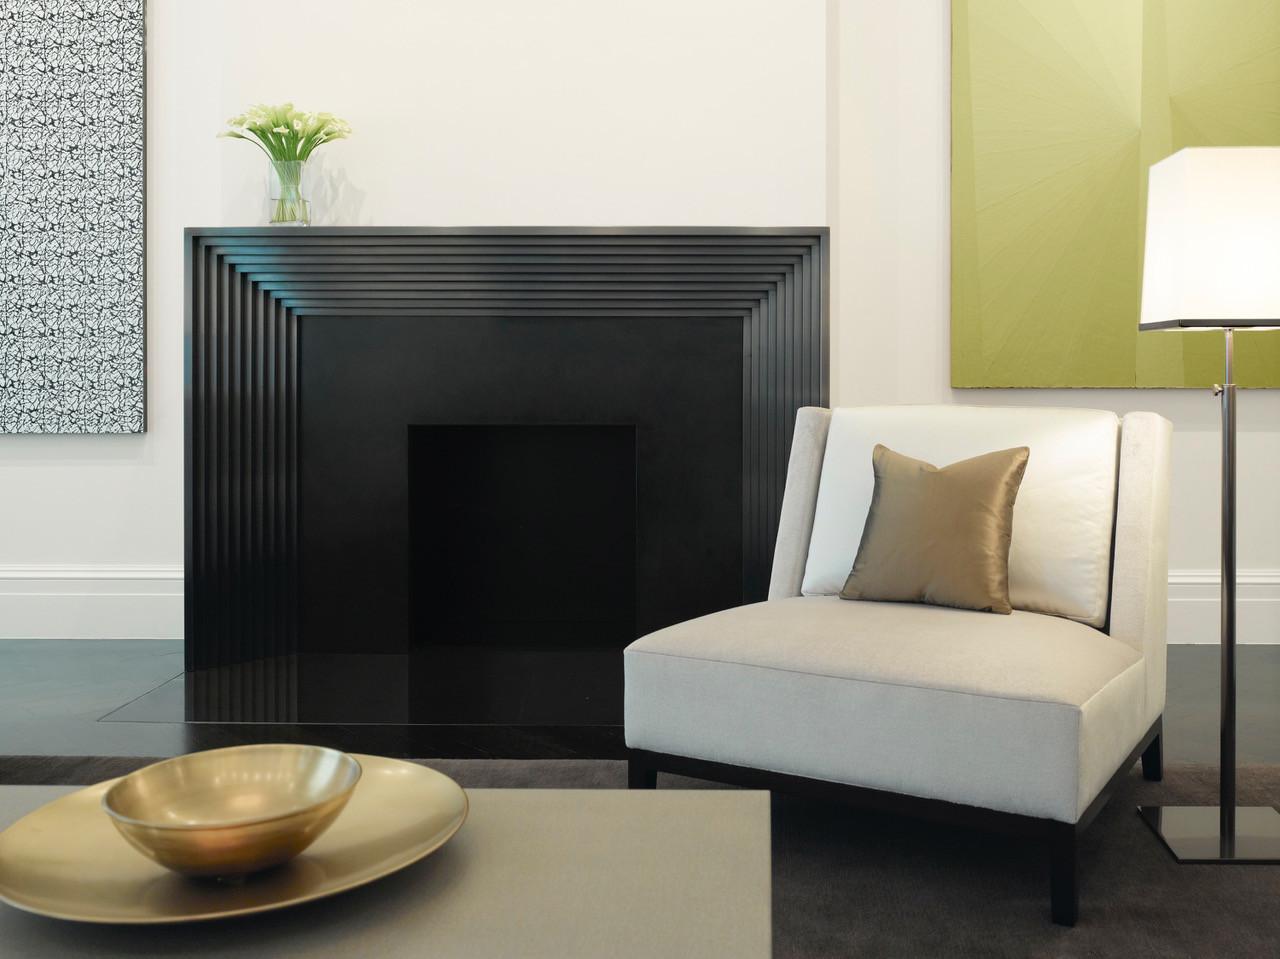 Nitzan Design | Modern, Minimal Interior Design | New York City, NY | The Townhouse Project